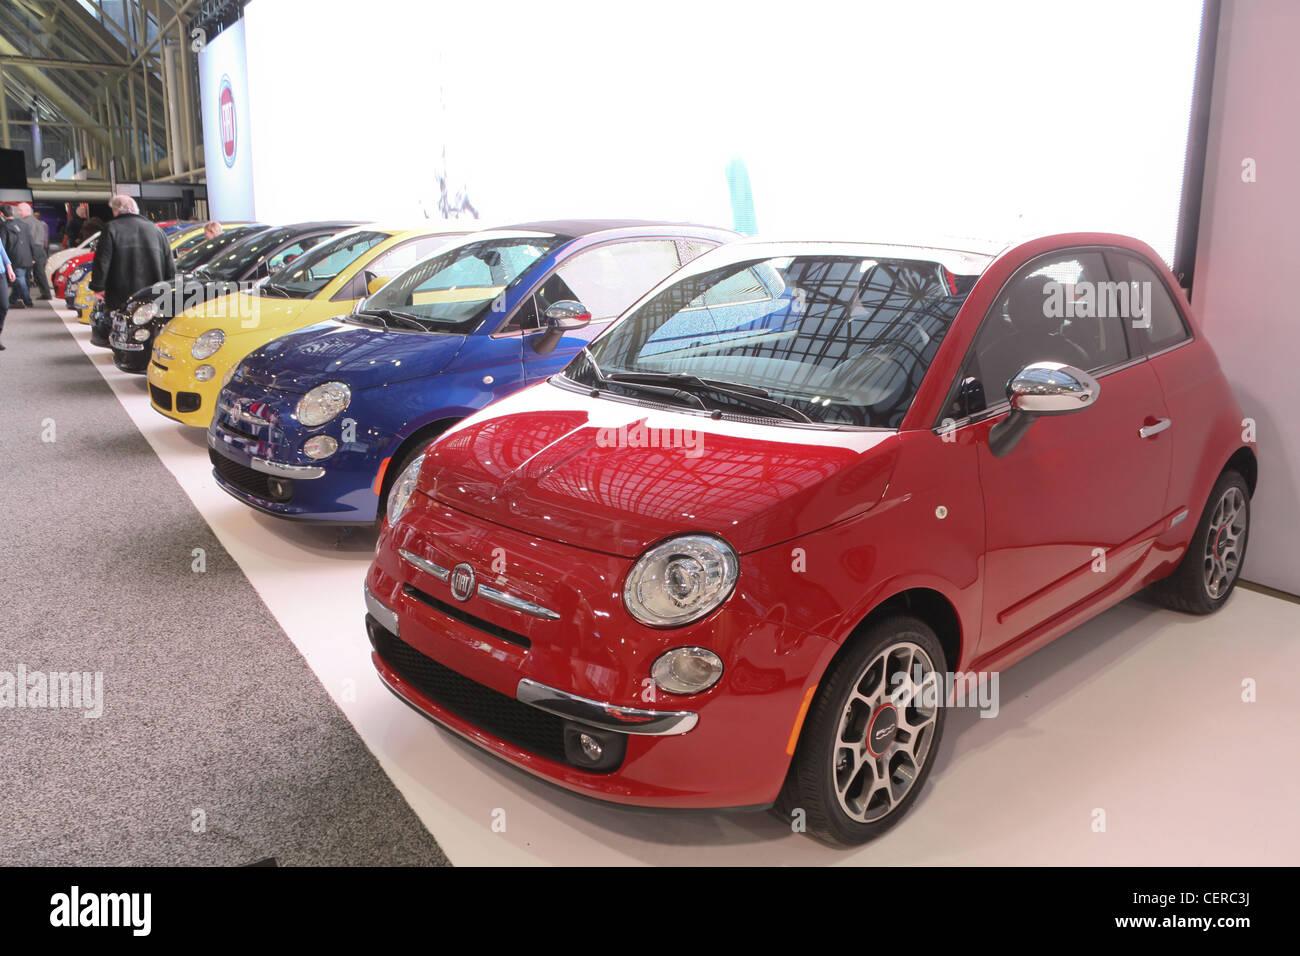 Autos in Zeilen Fiat 500 Stockbild